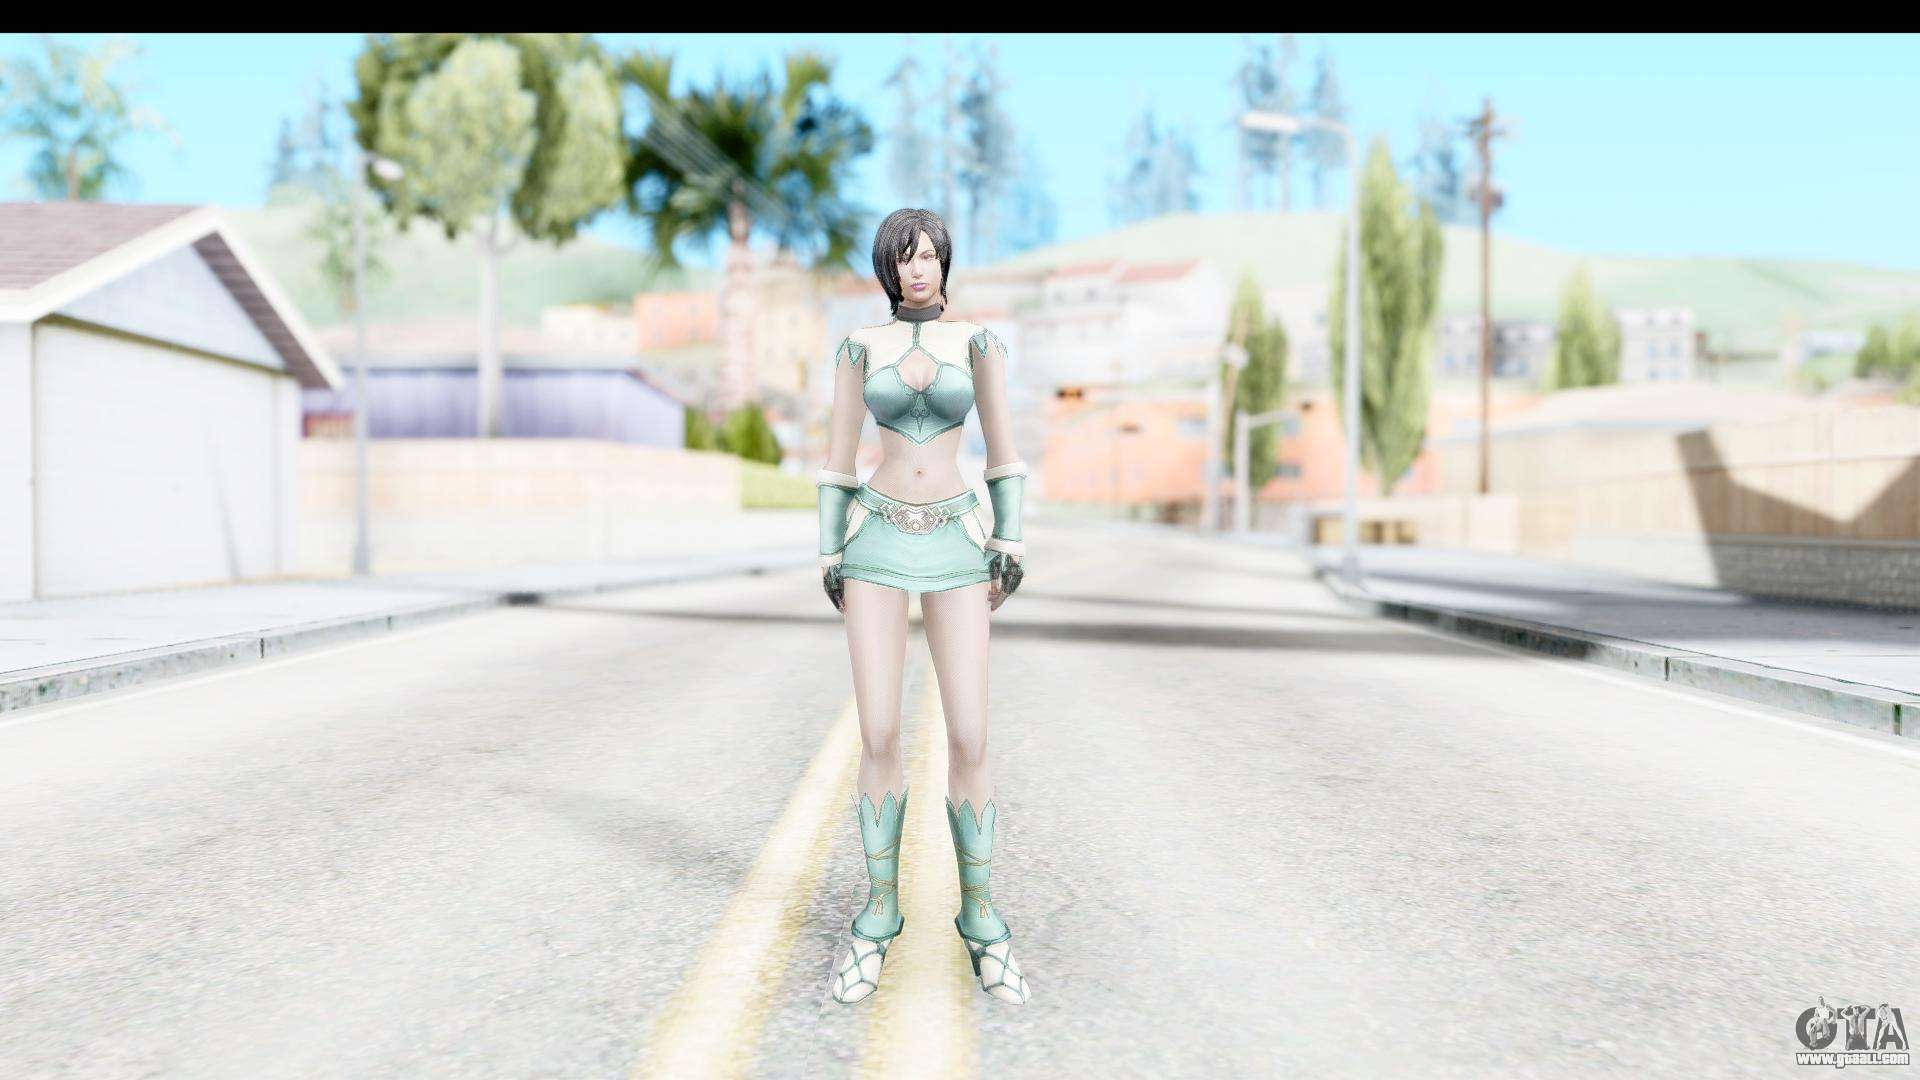 Ada Wong II for GTA San Andreas